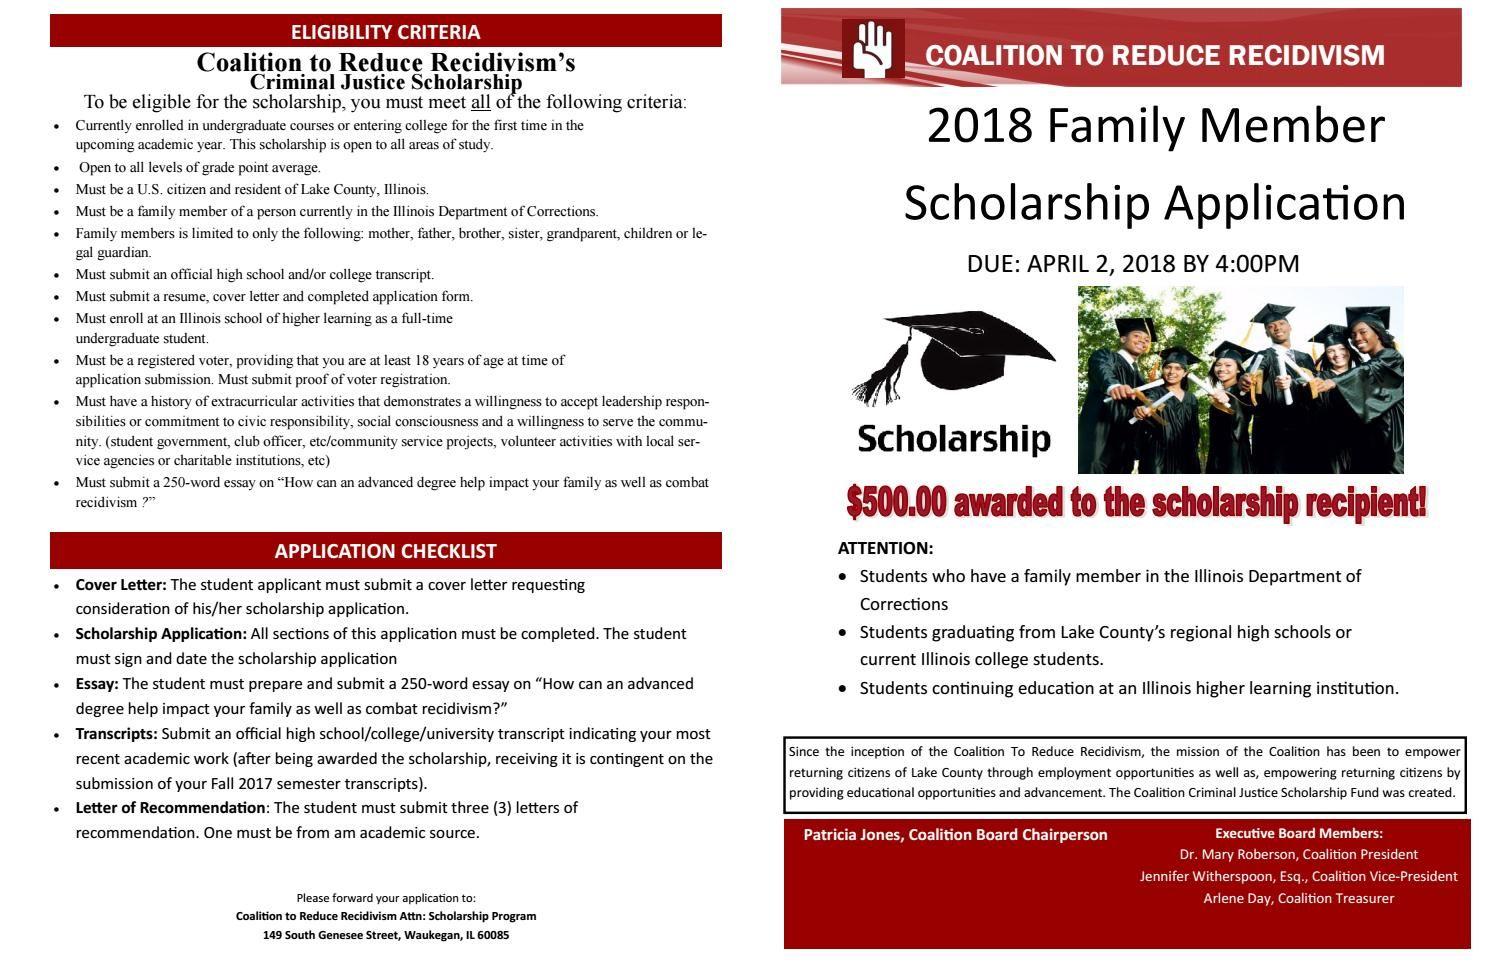 2018 Coalition Family Scholarship Application